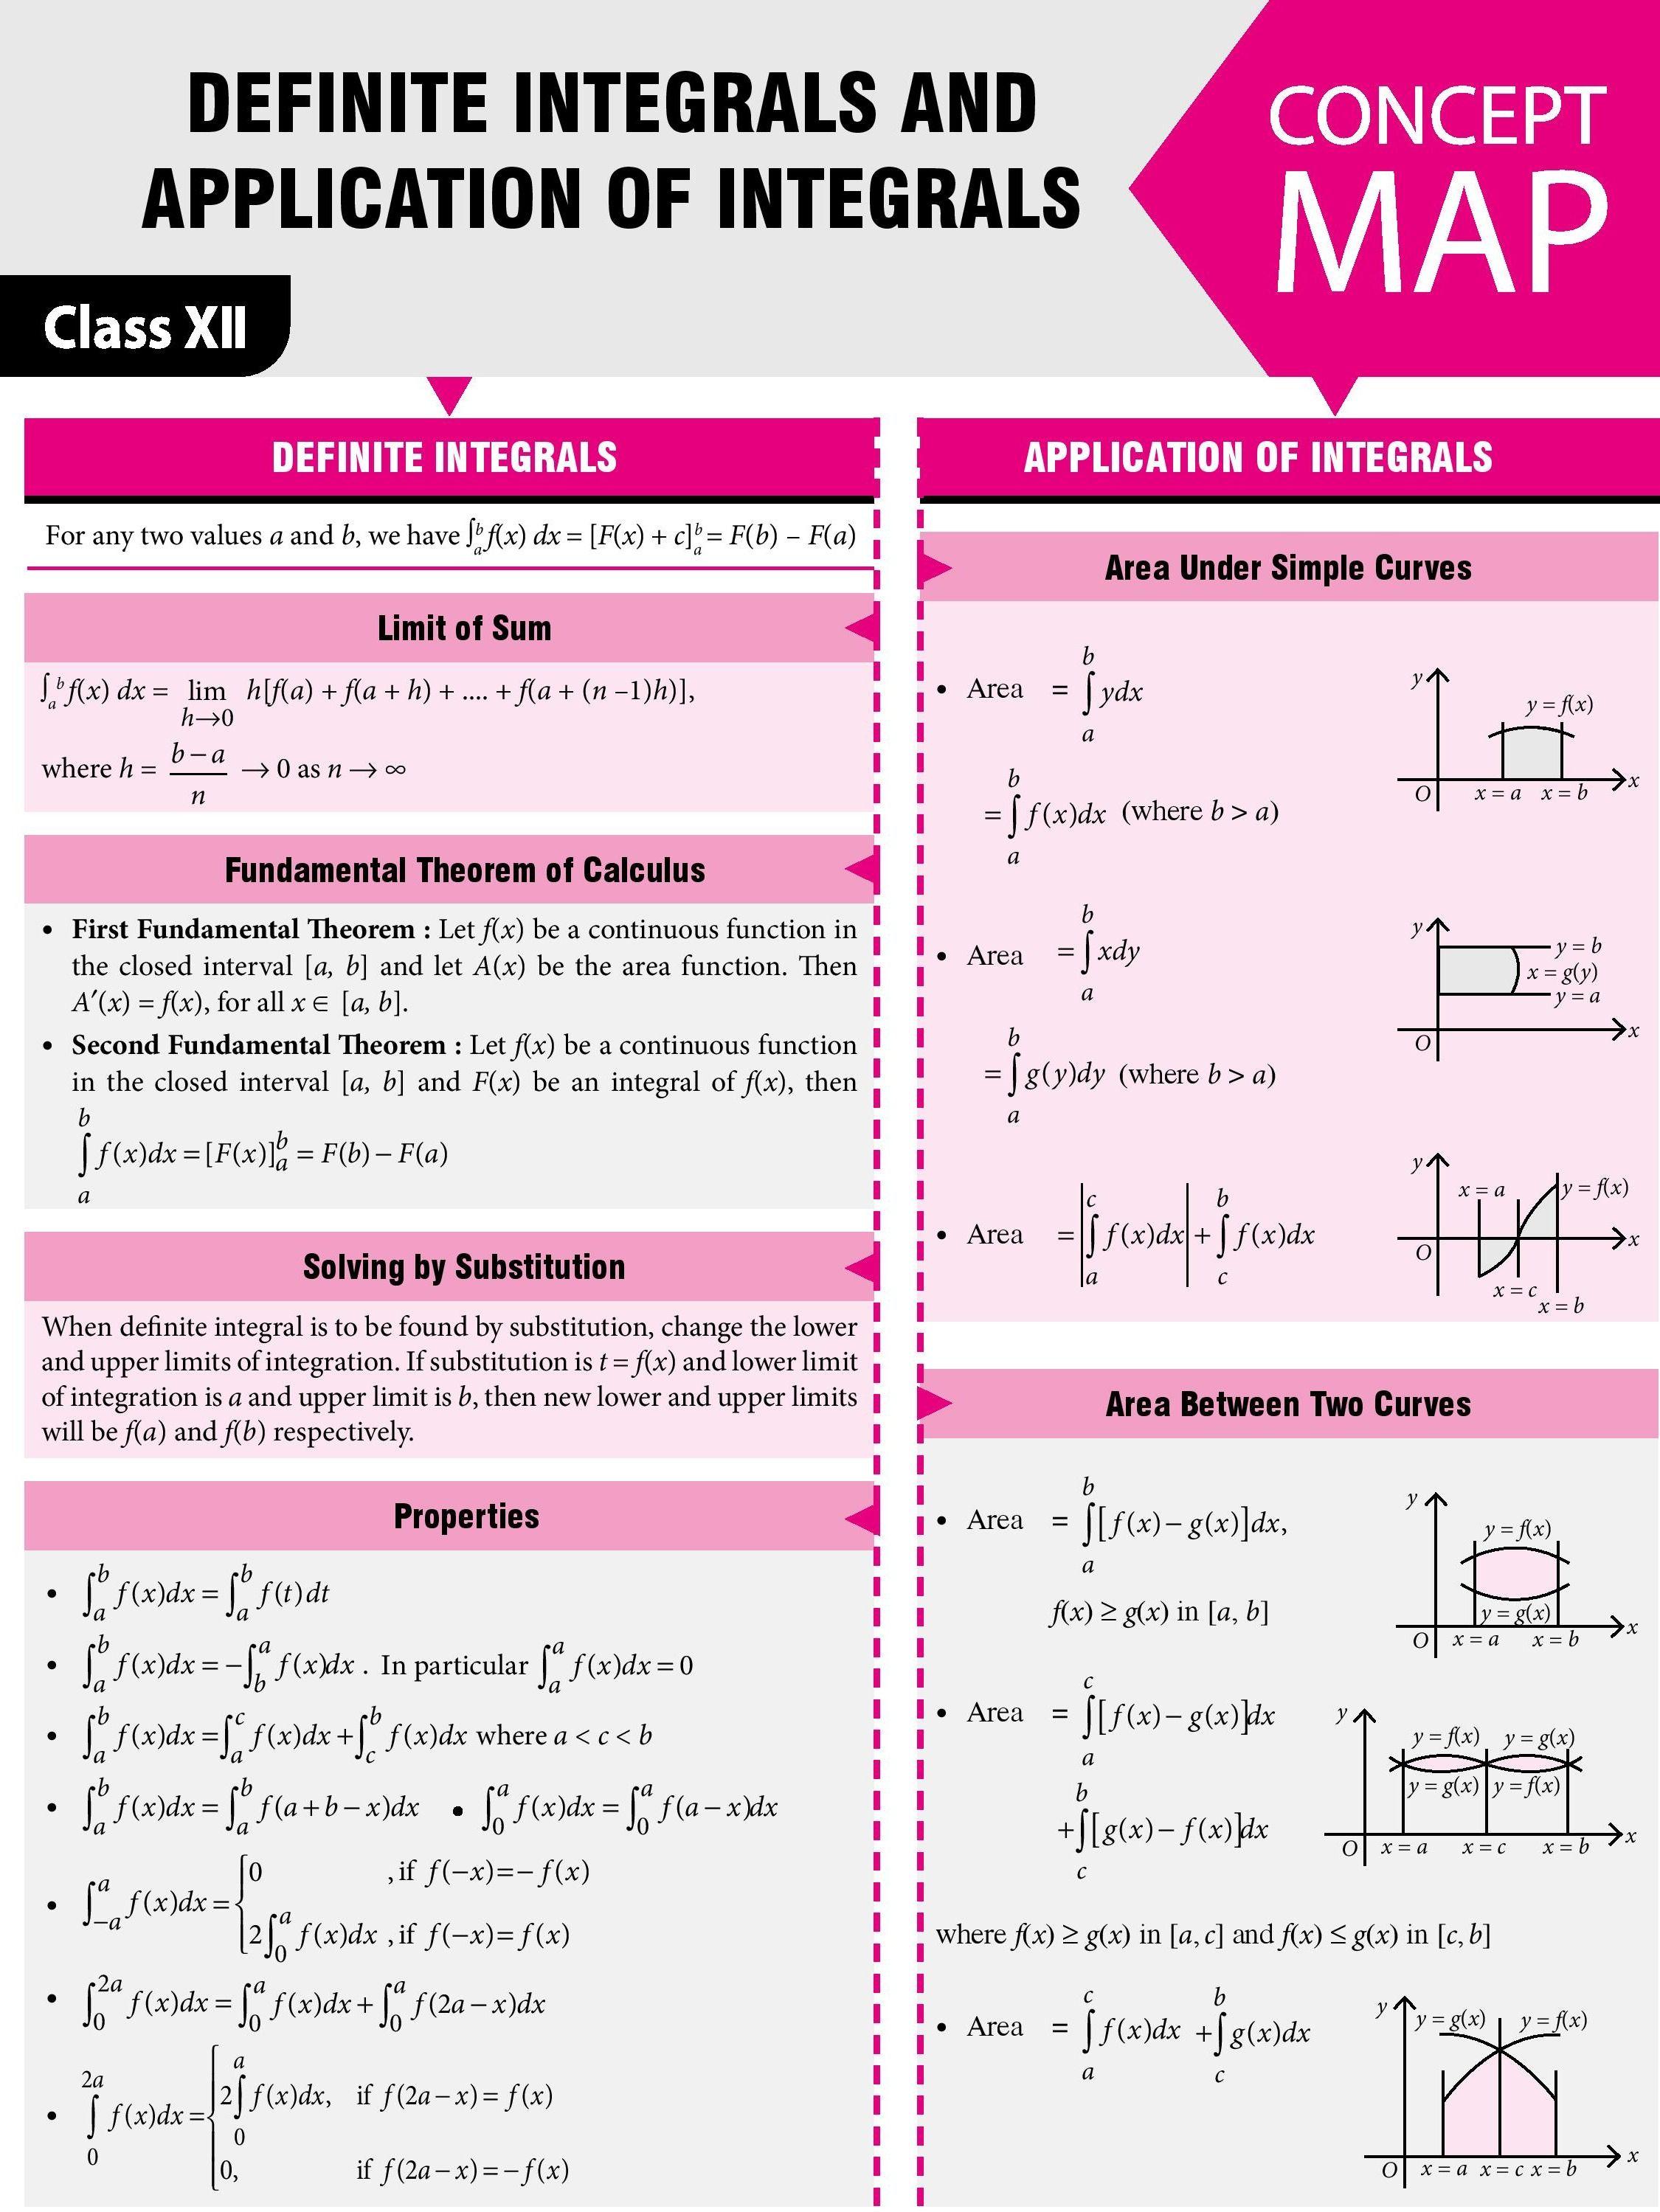 Pin By Venkateshwarlu Velpula On Organic Chemistry In 2020 Studying Math Mathematics Mathematics Worksheets